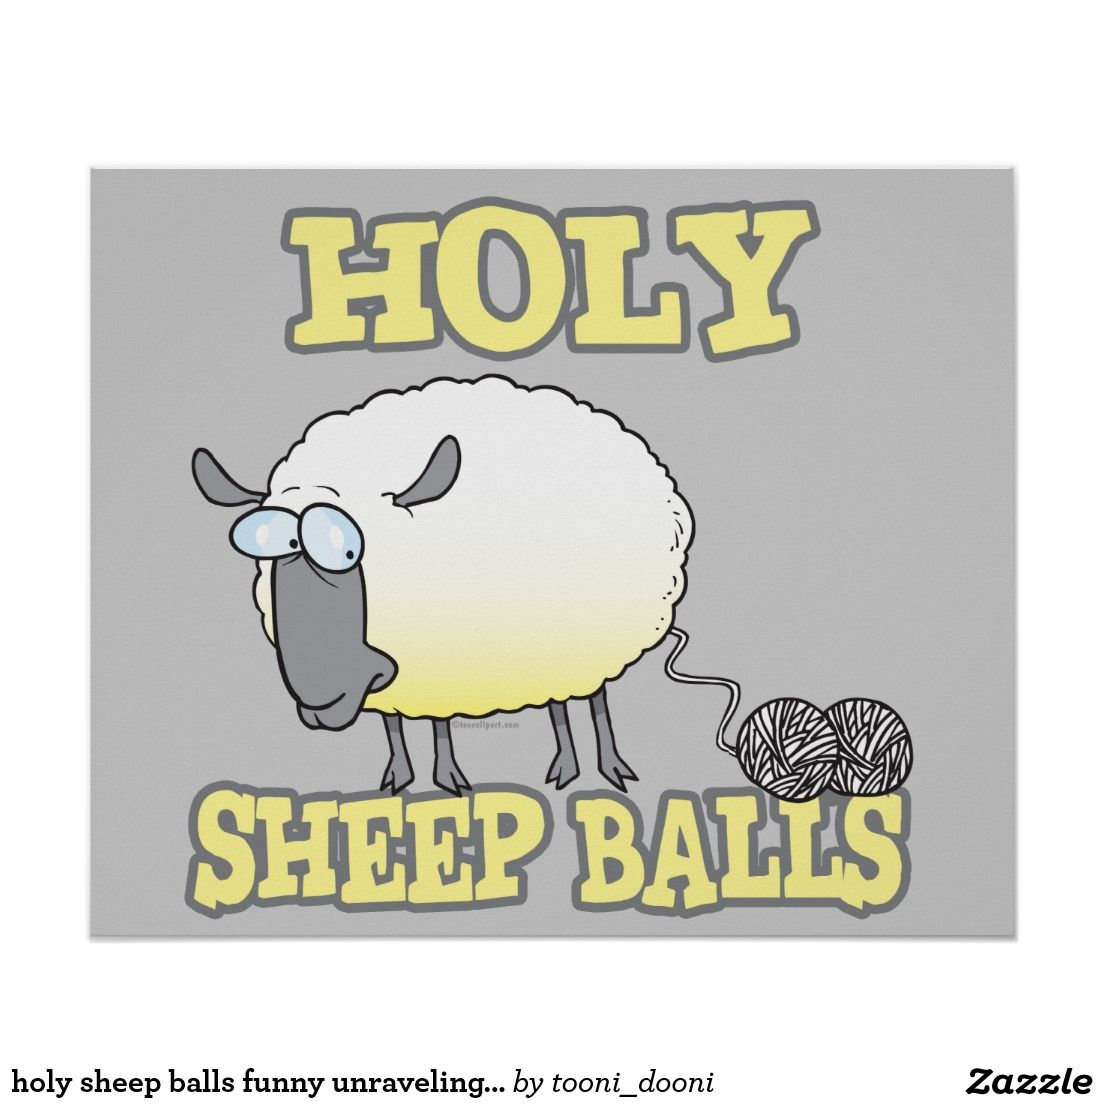 holy sheep balls funny unraveling yarn sheep posters